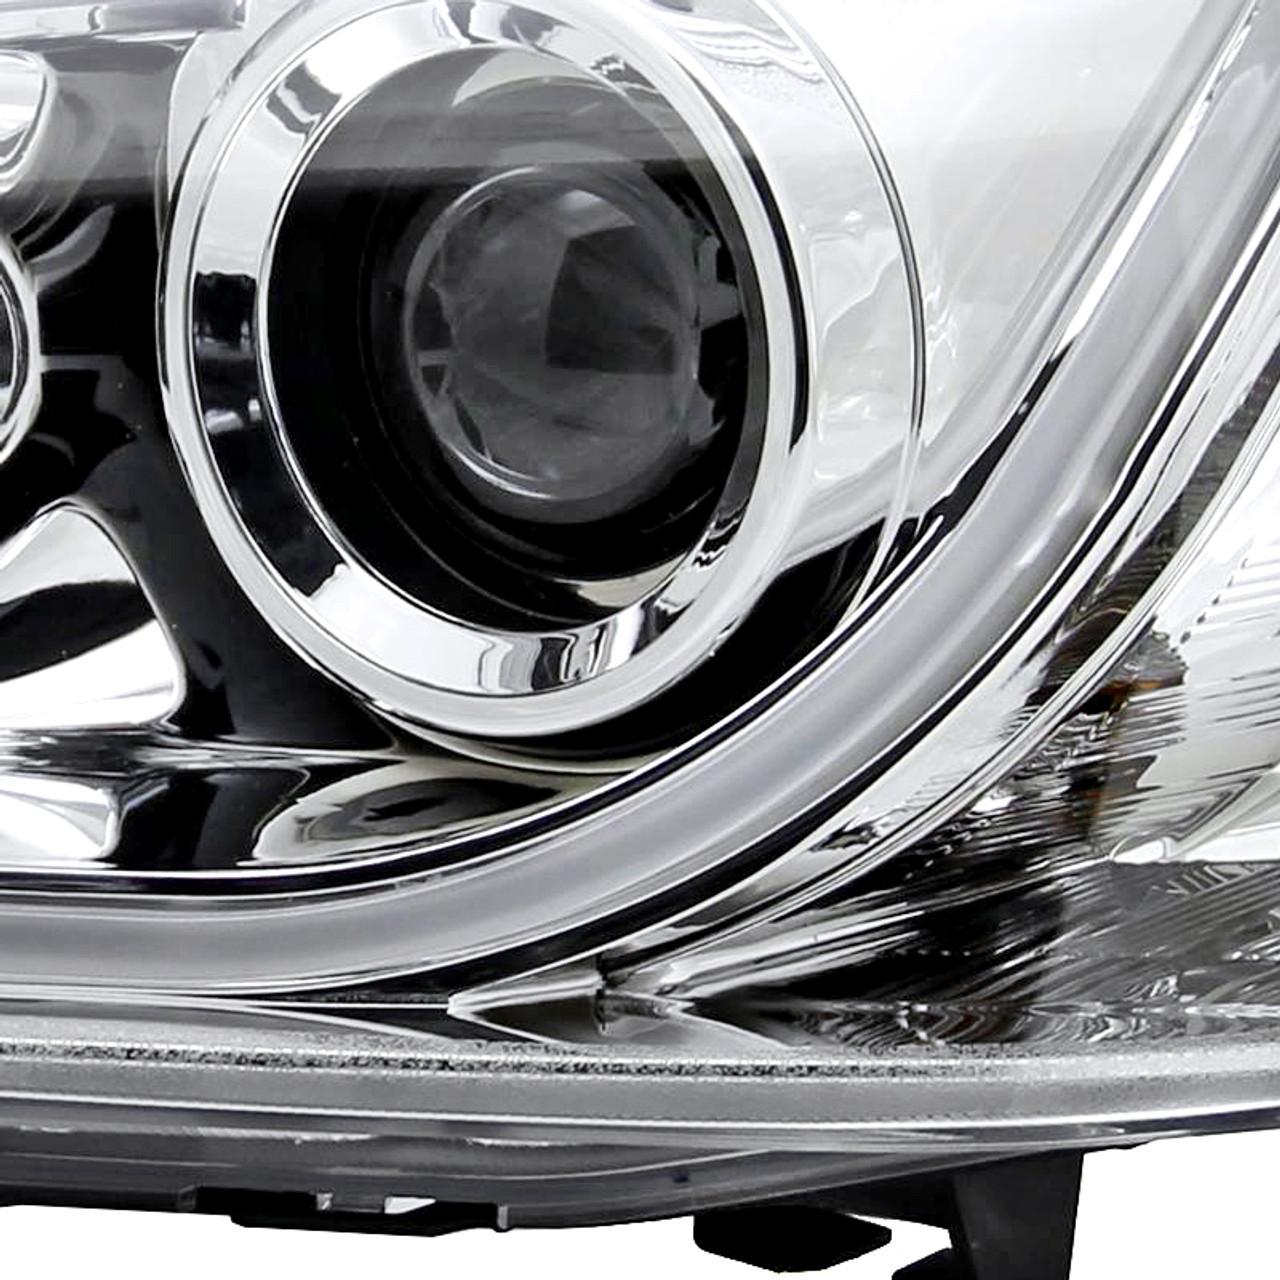 2008 2009 pontiac g8 led projector headlights chrome housing clear lens spec d tuning 2008 2009 pontiac g8 led projector